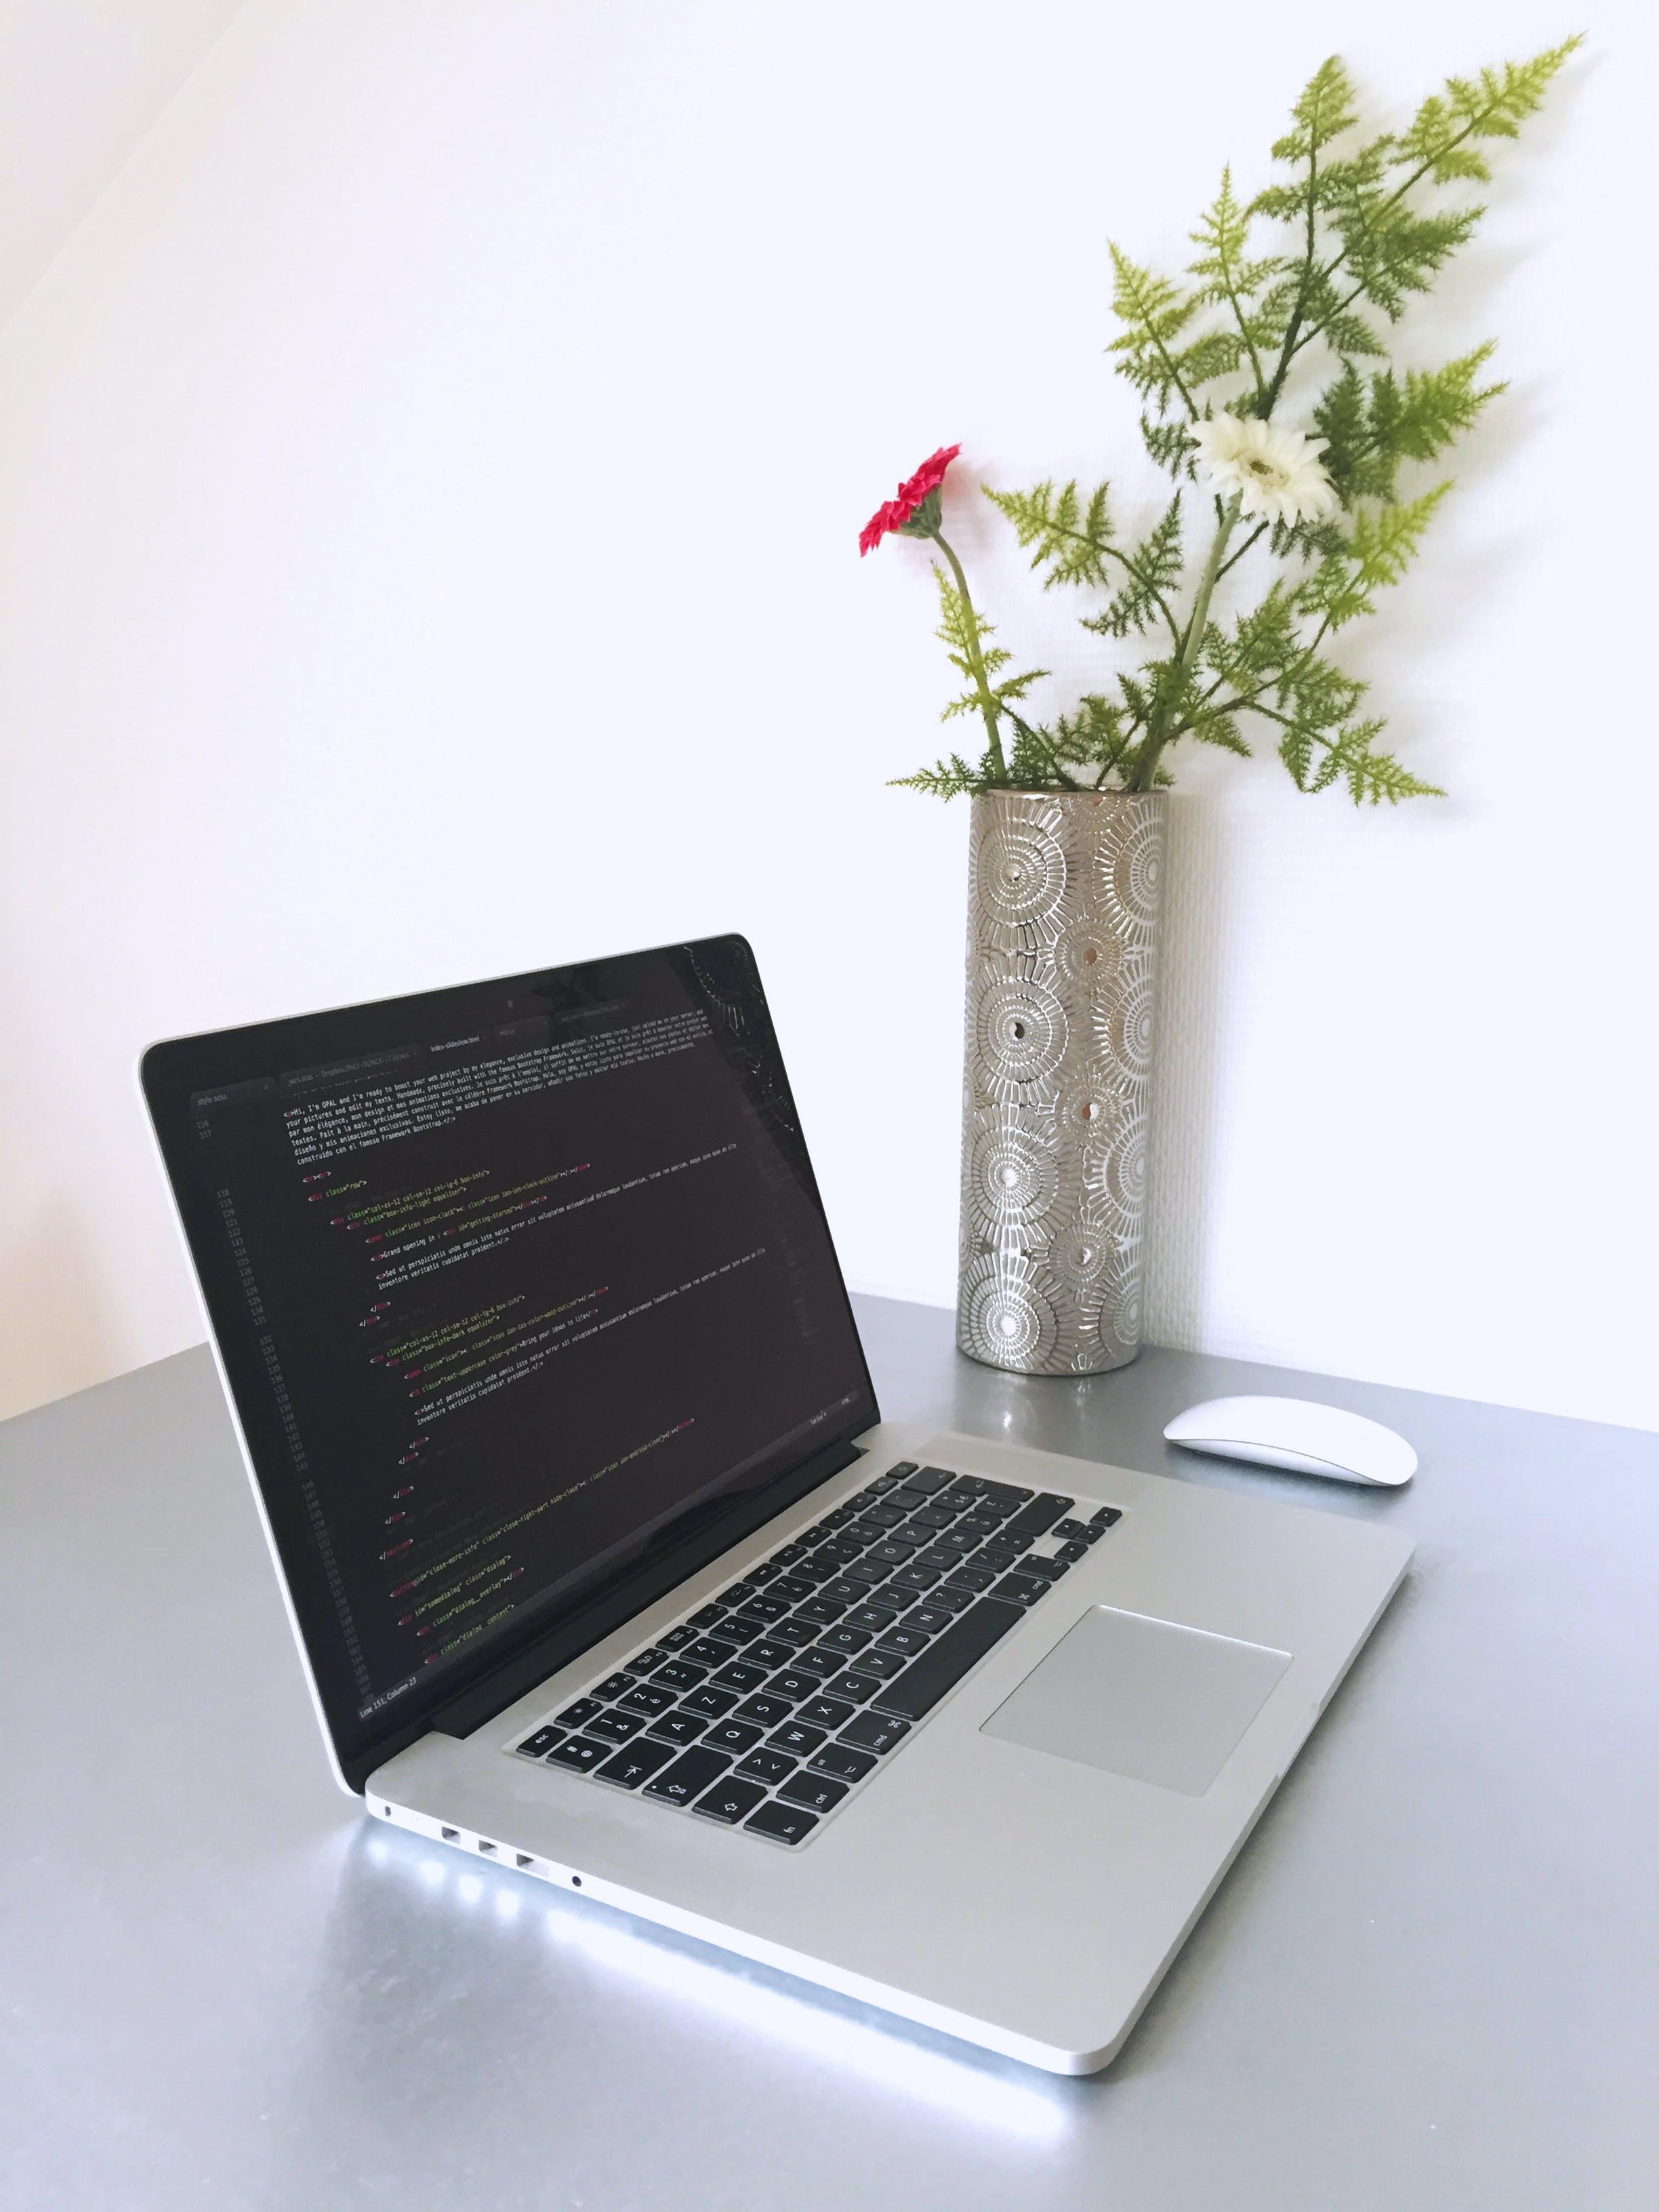 Kostenloses Stock Foto zu code, kodieren, laptop, macbook pro